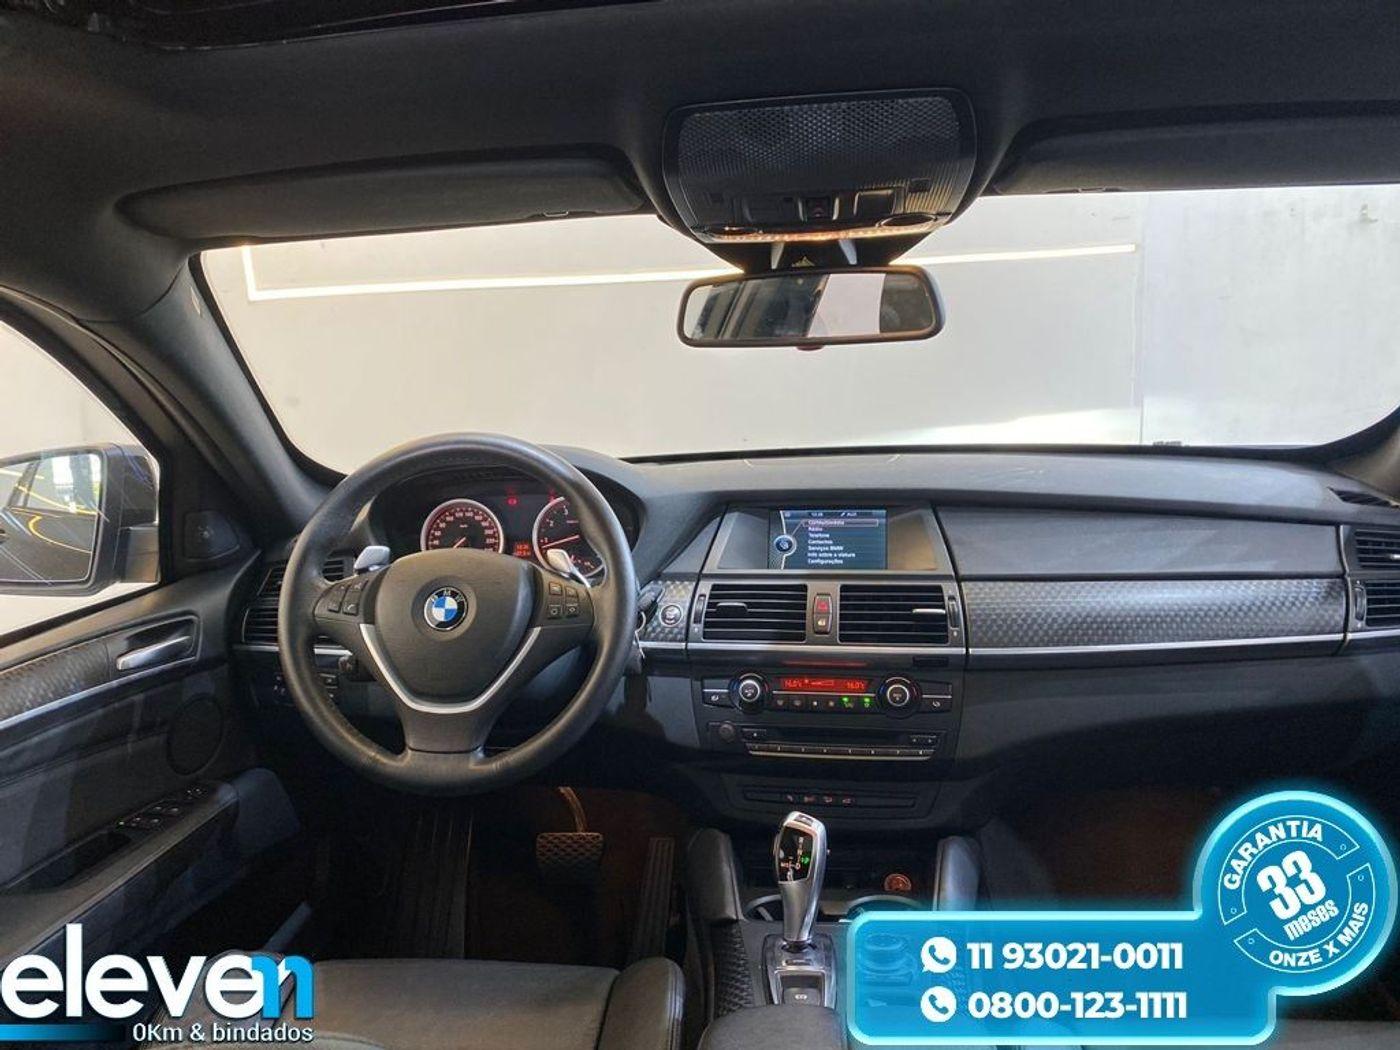 BMW X6 XDRIVE 50i 4.4 407cv Bi-Turbo